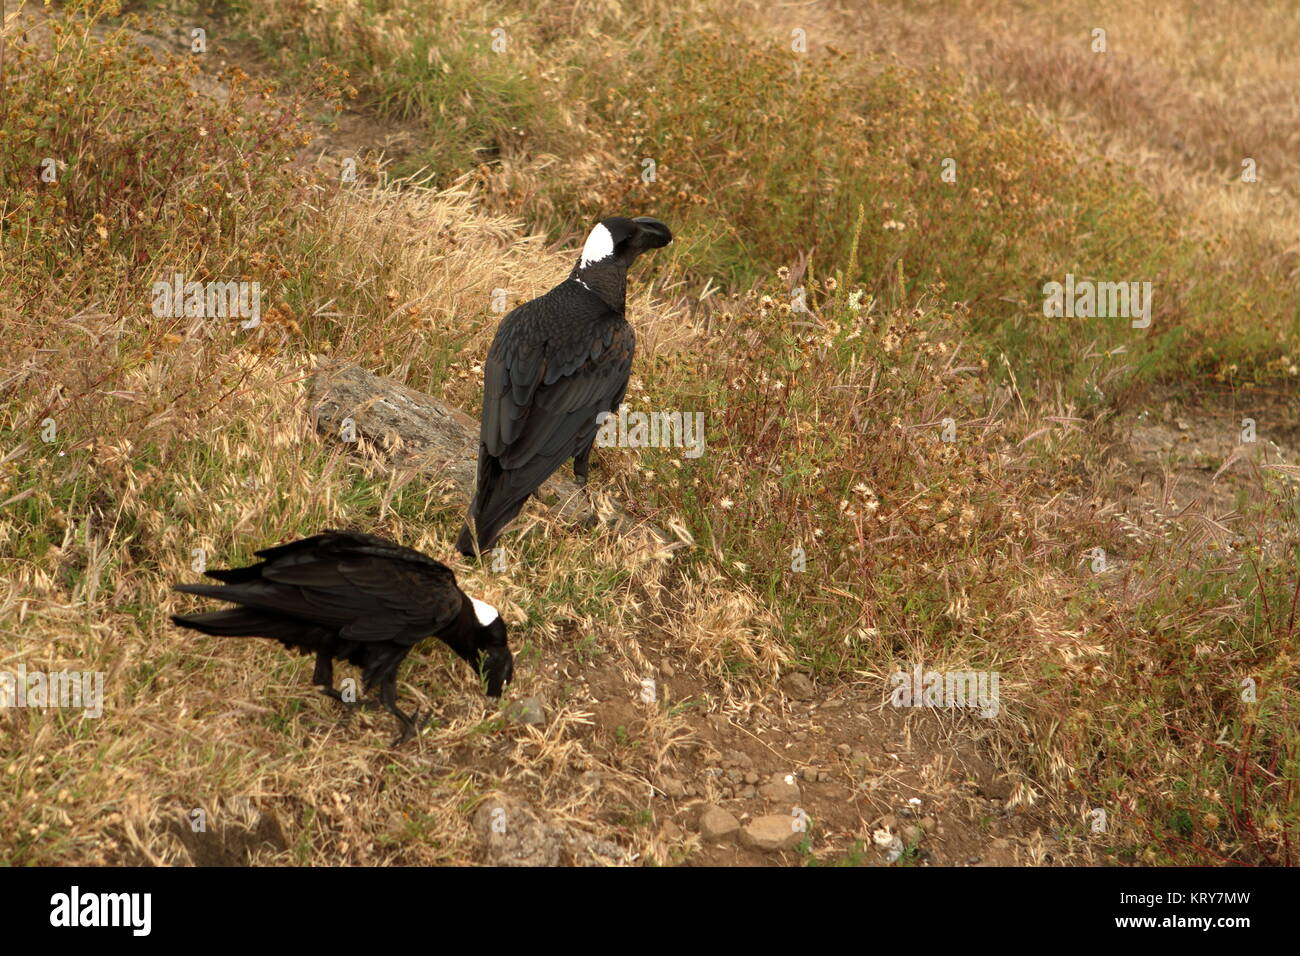 erzraben from ethiopia - Stock Image